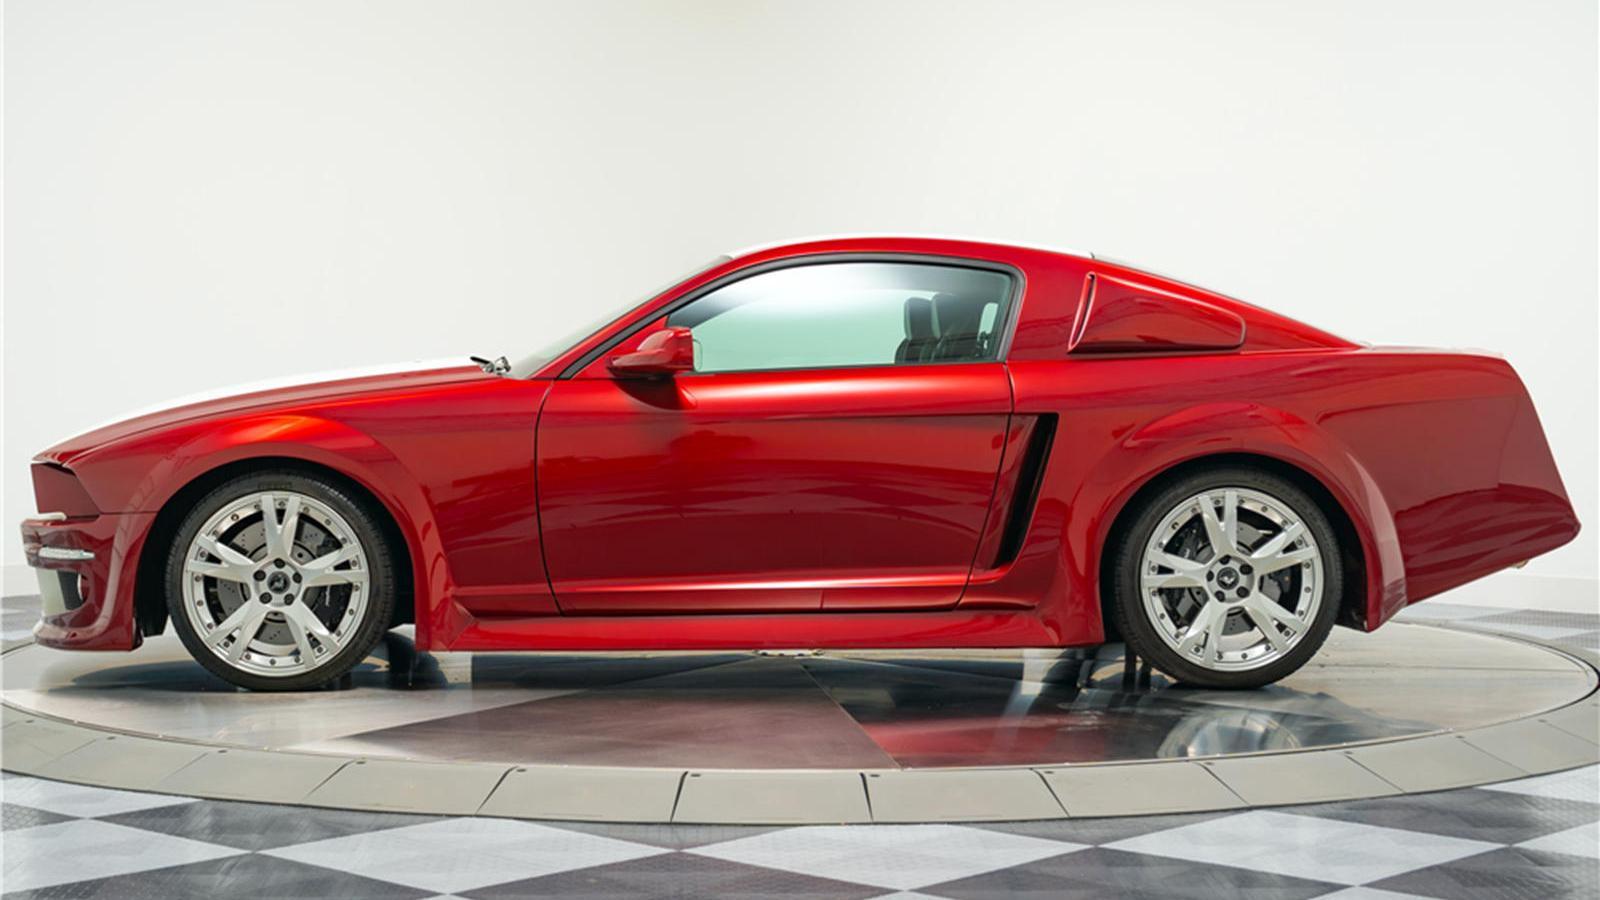 2007 Mustang Gets Lamborghini Gallardo Fusion